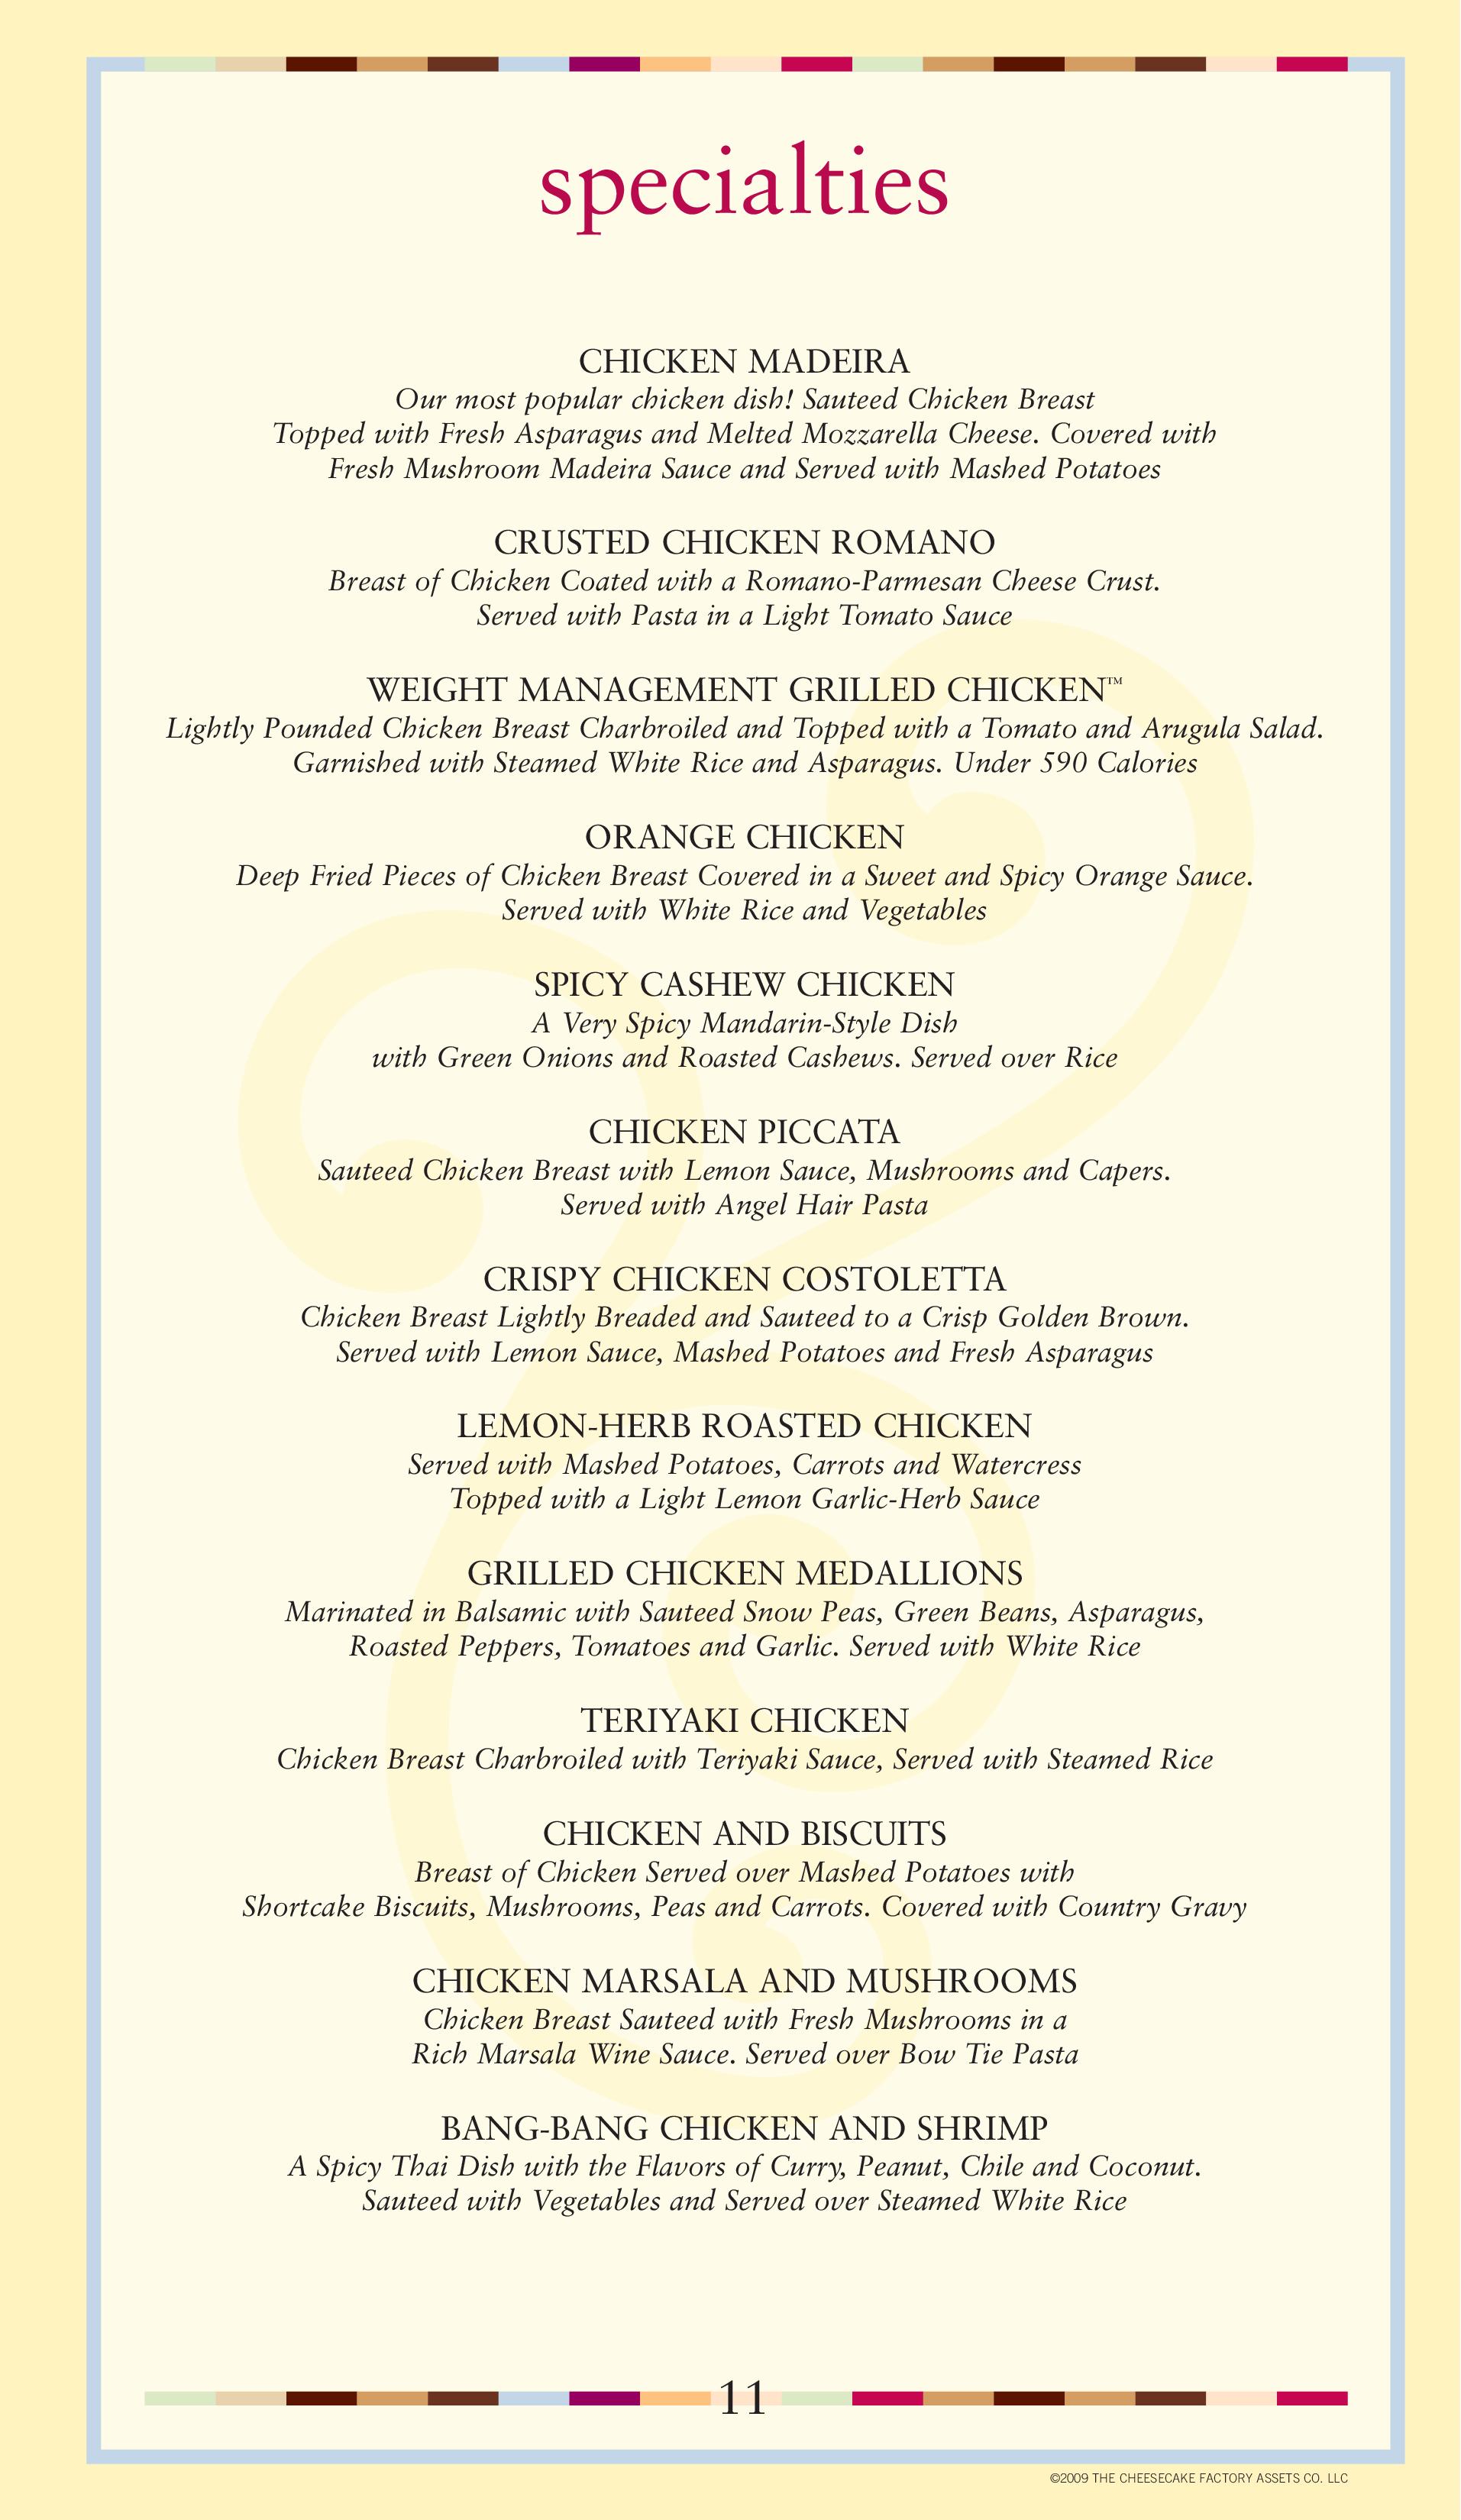 cheesecake factory printable menu That are Wild | Derrick ...